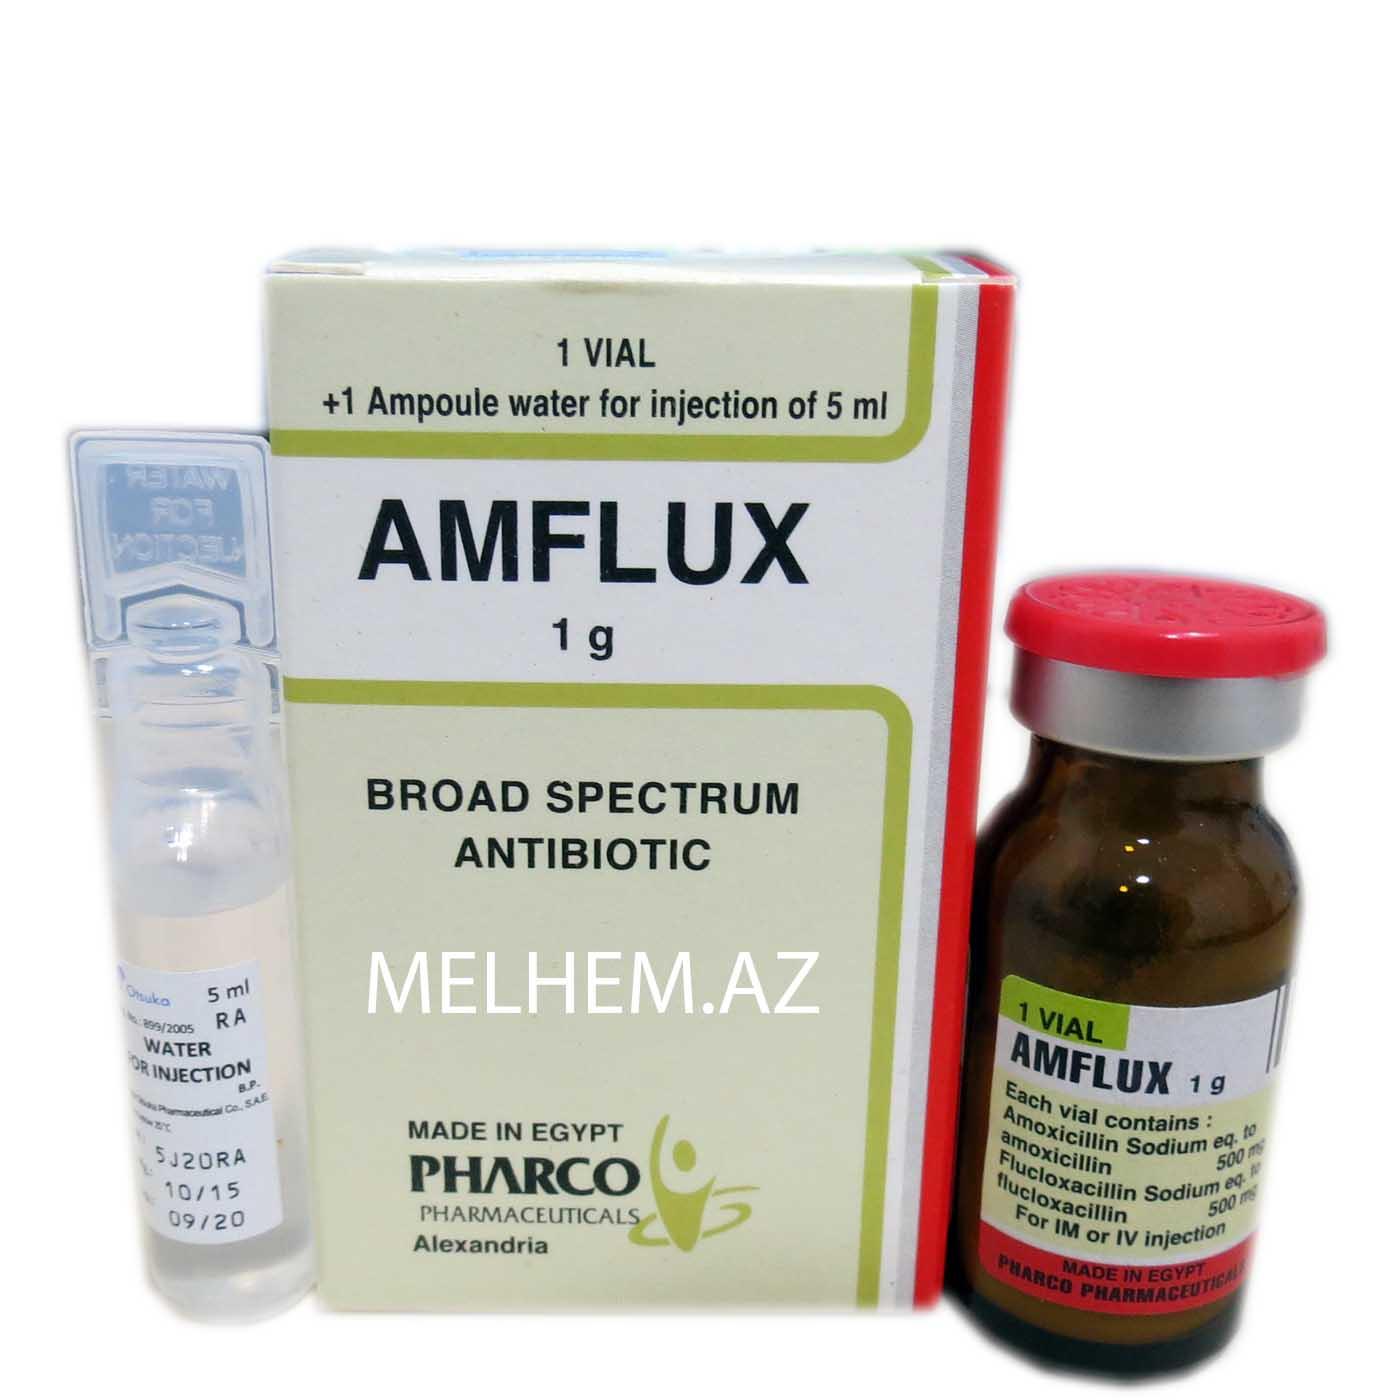 AMFLUKS 1 G